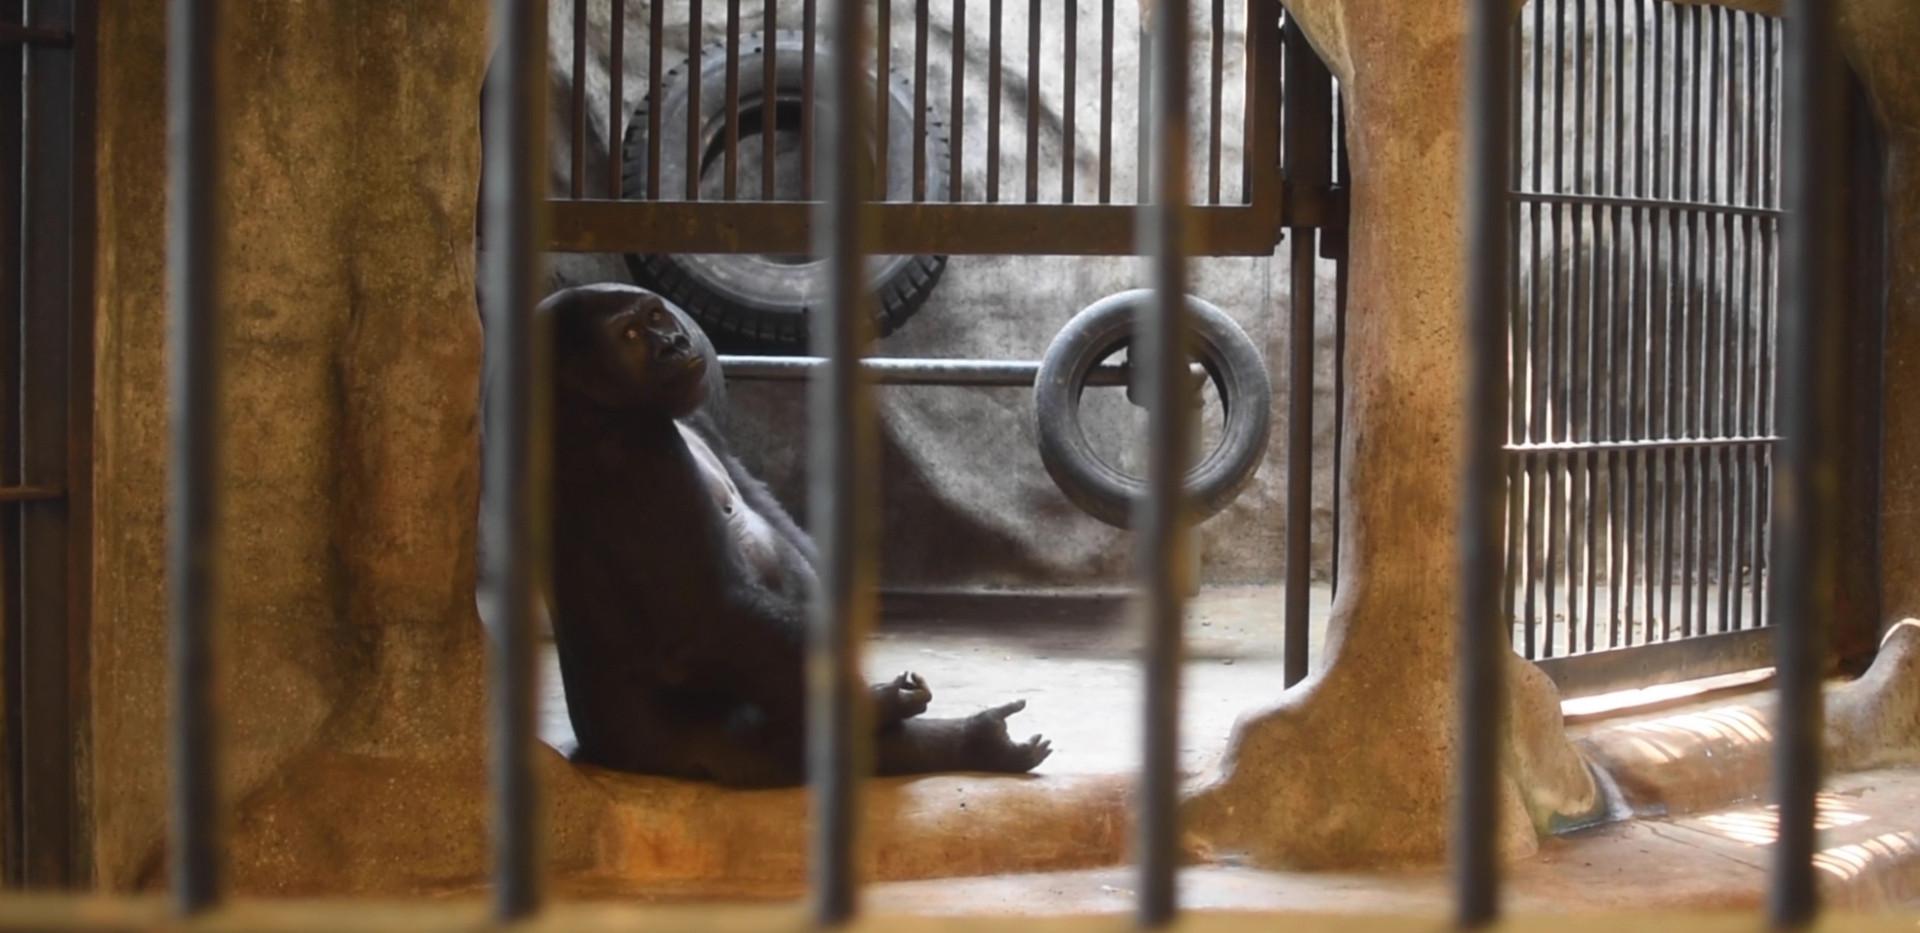 stolen apes1 (3).jpg